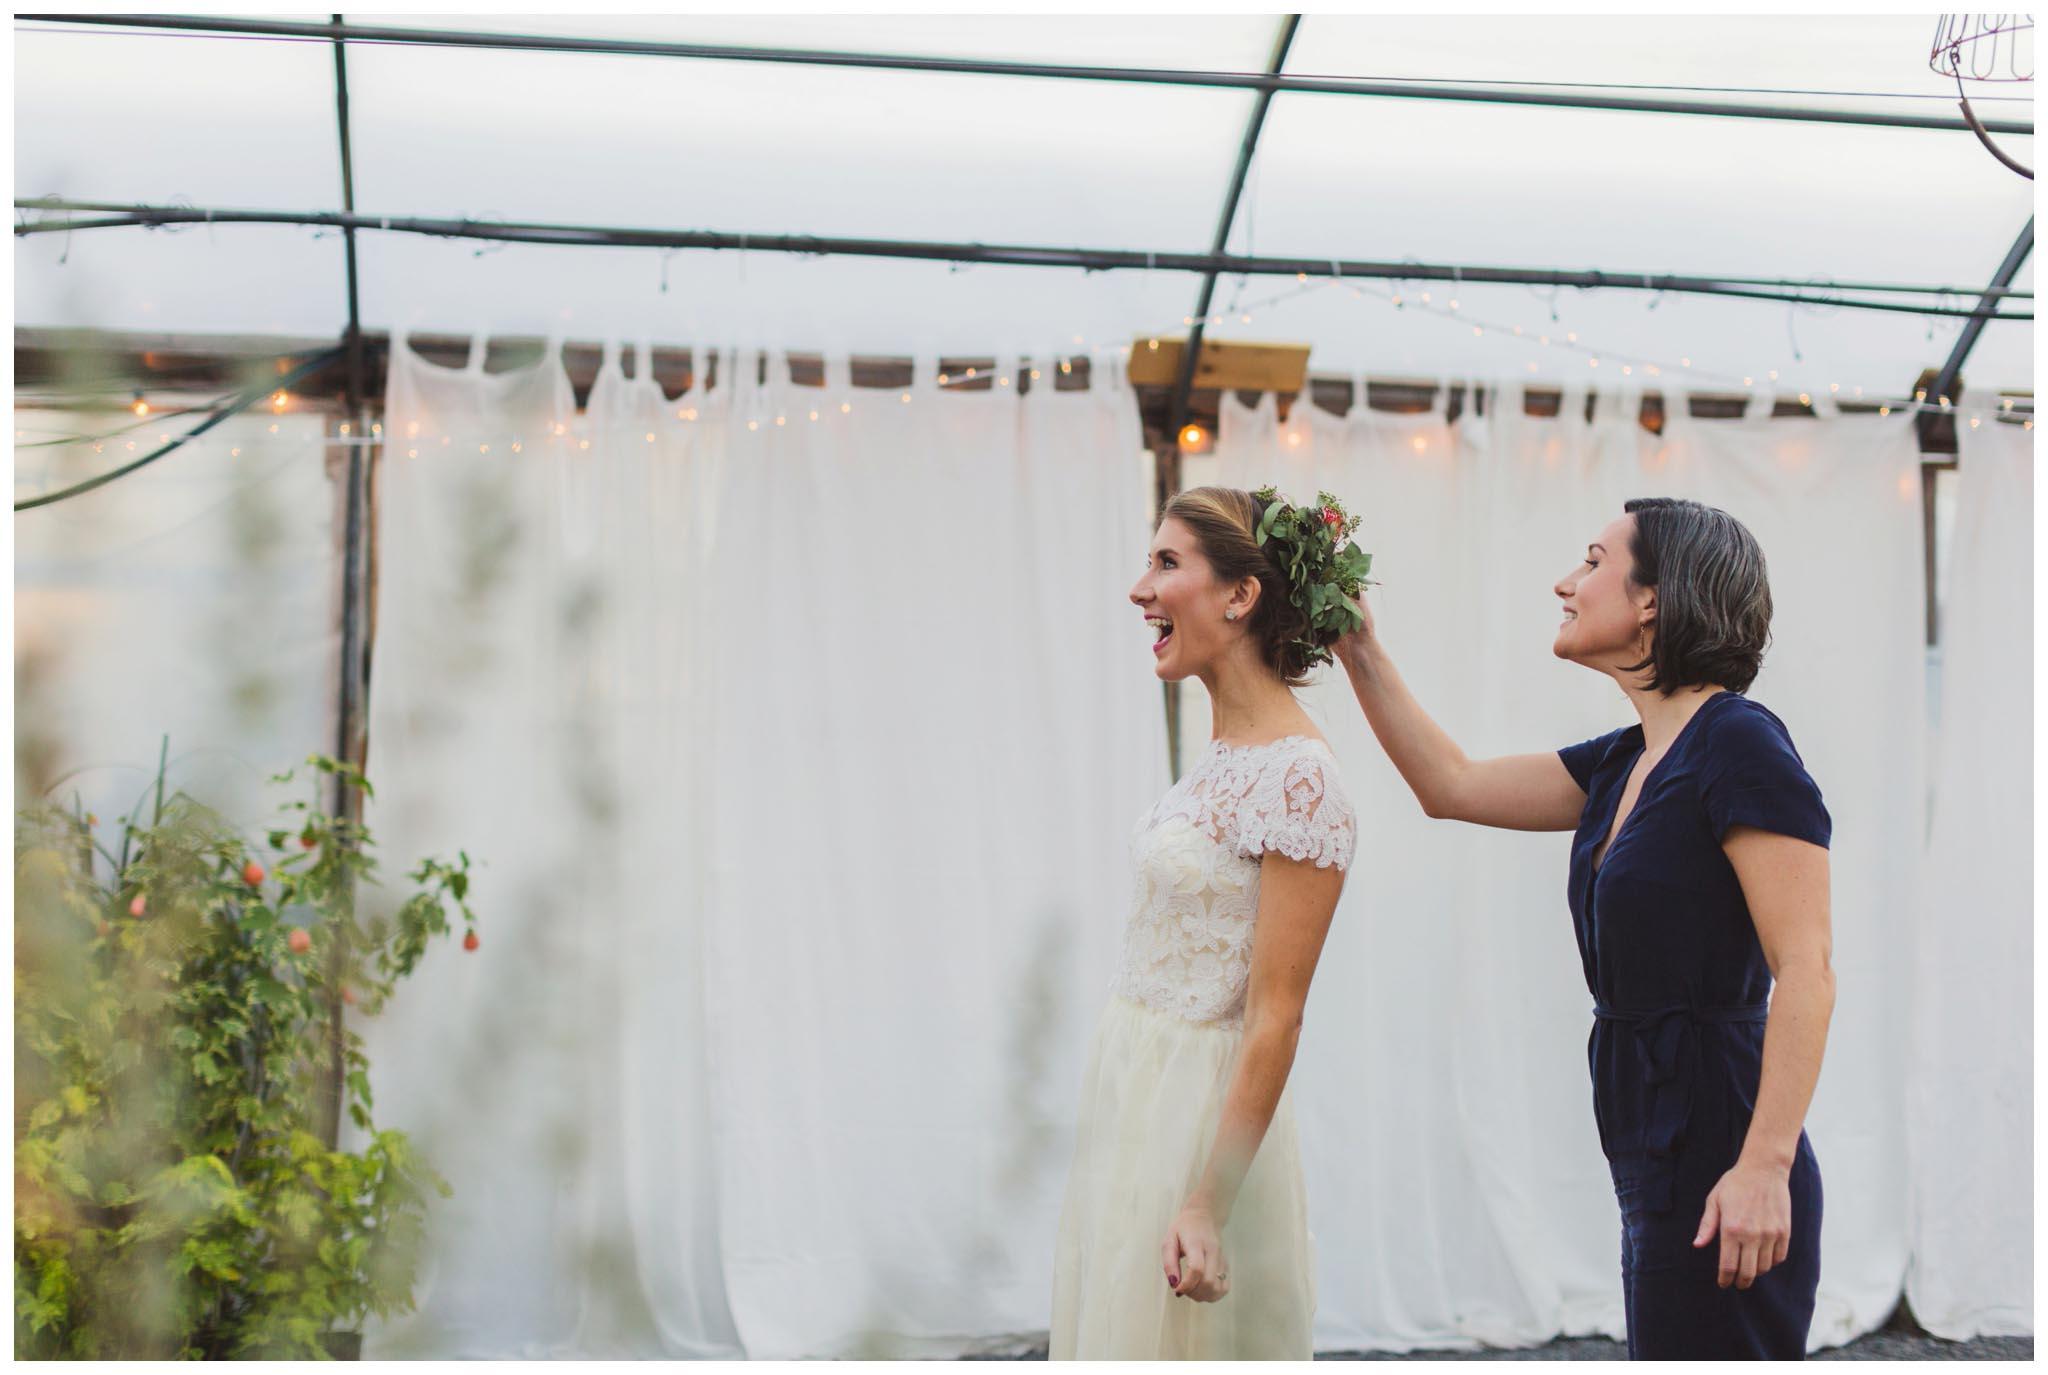 Greensgrow Farms, wedding